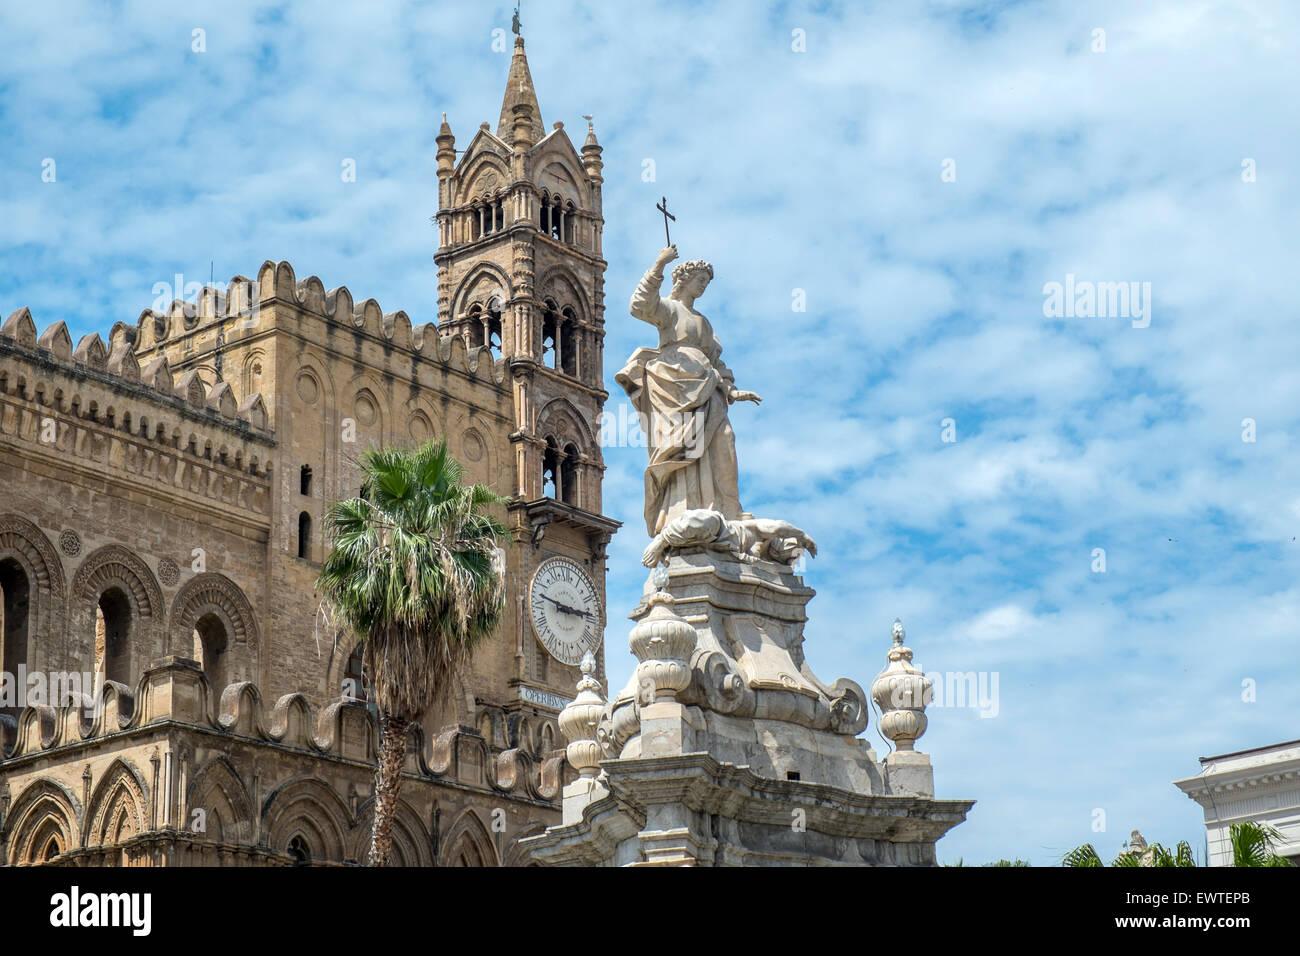 Der Dom in Palermo, Sizilien. Stockbild